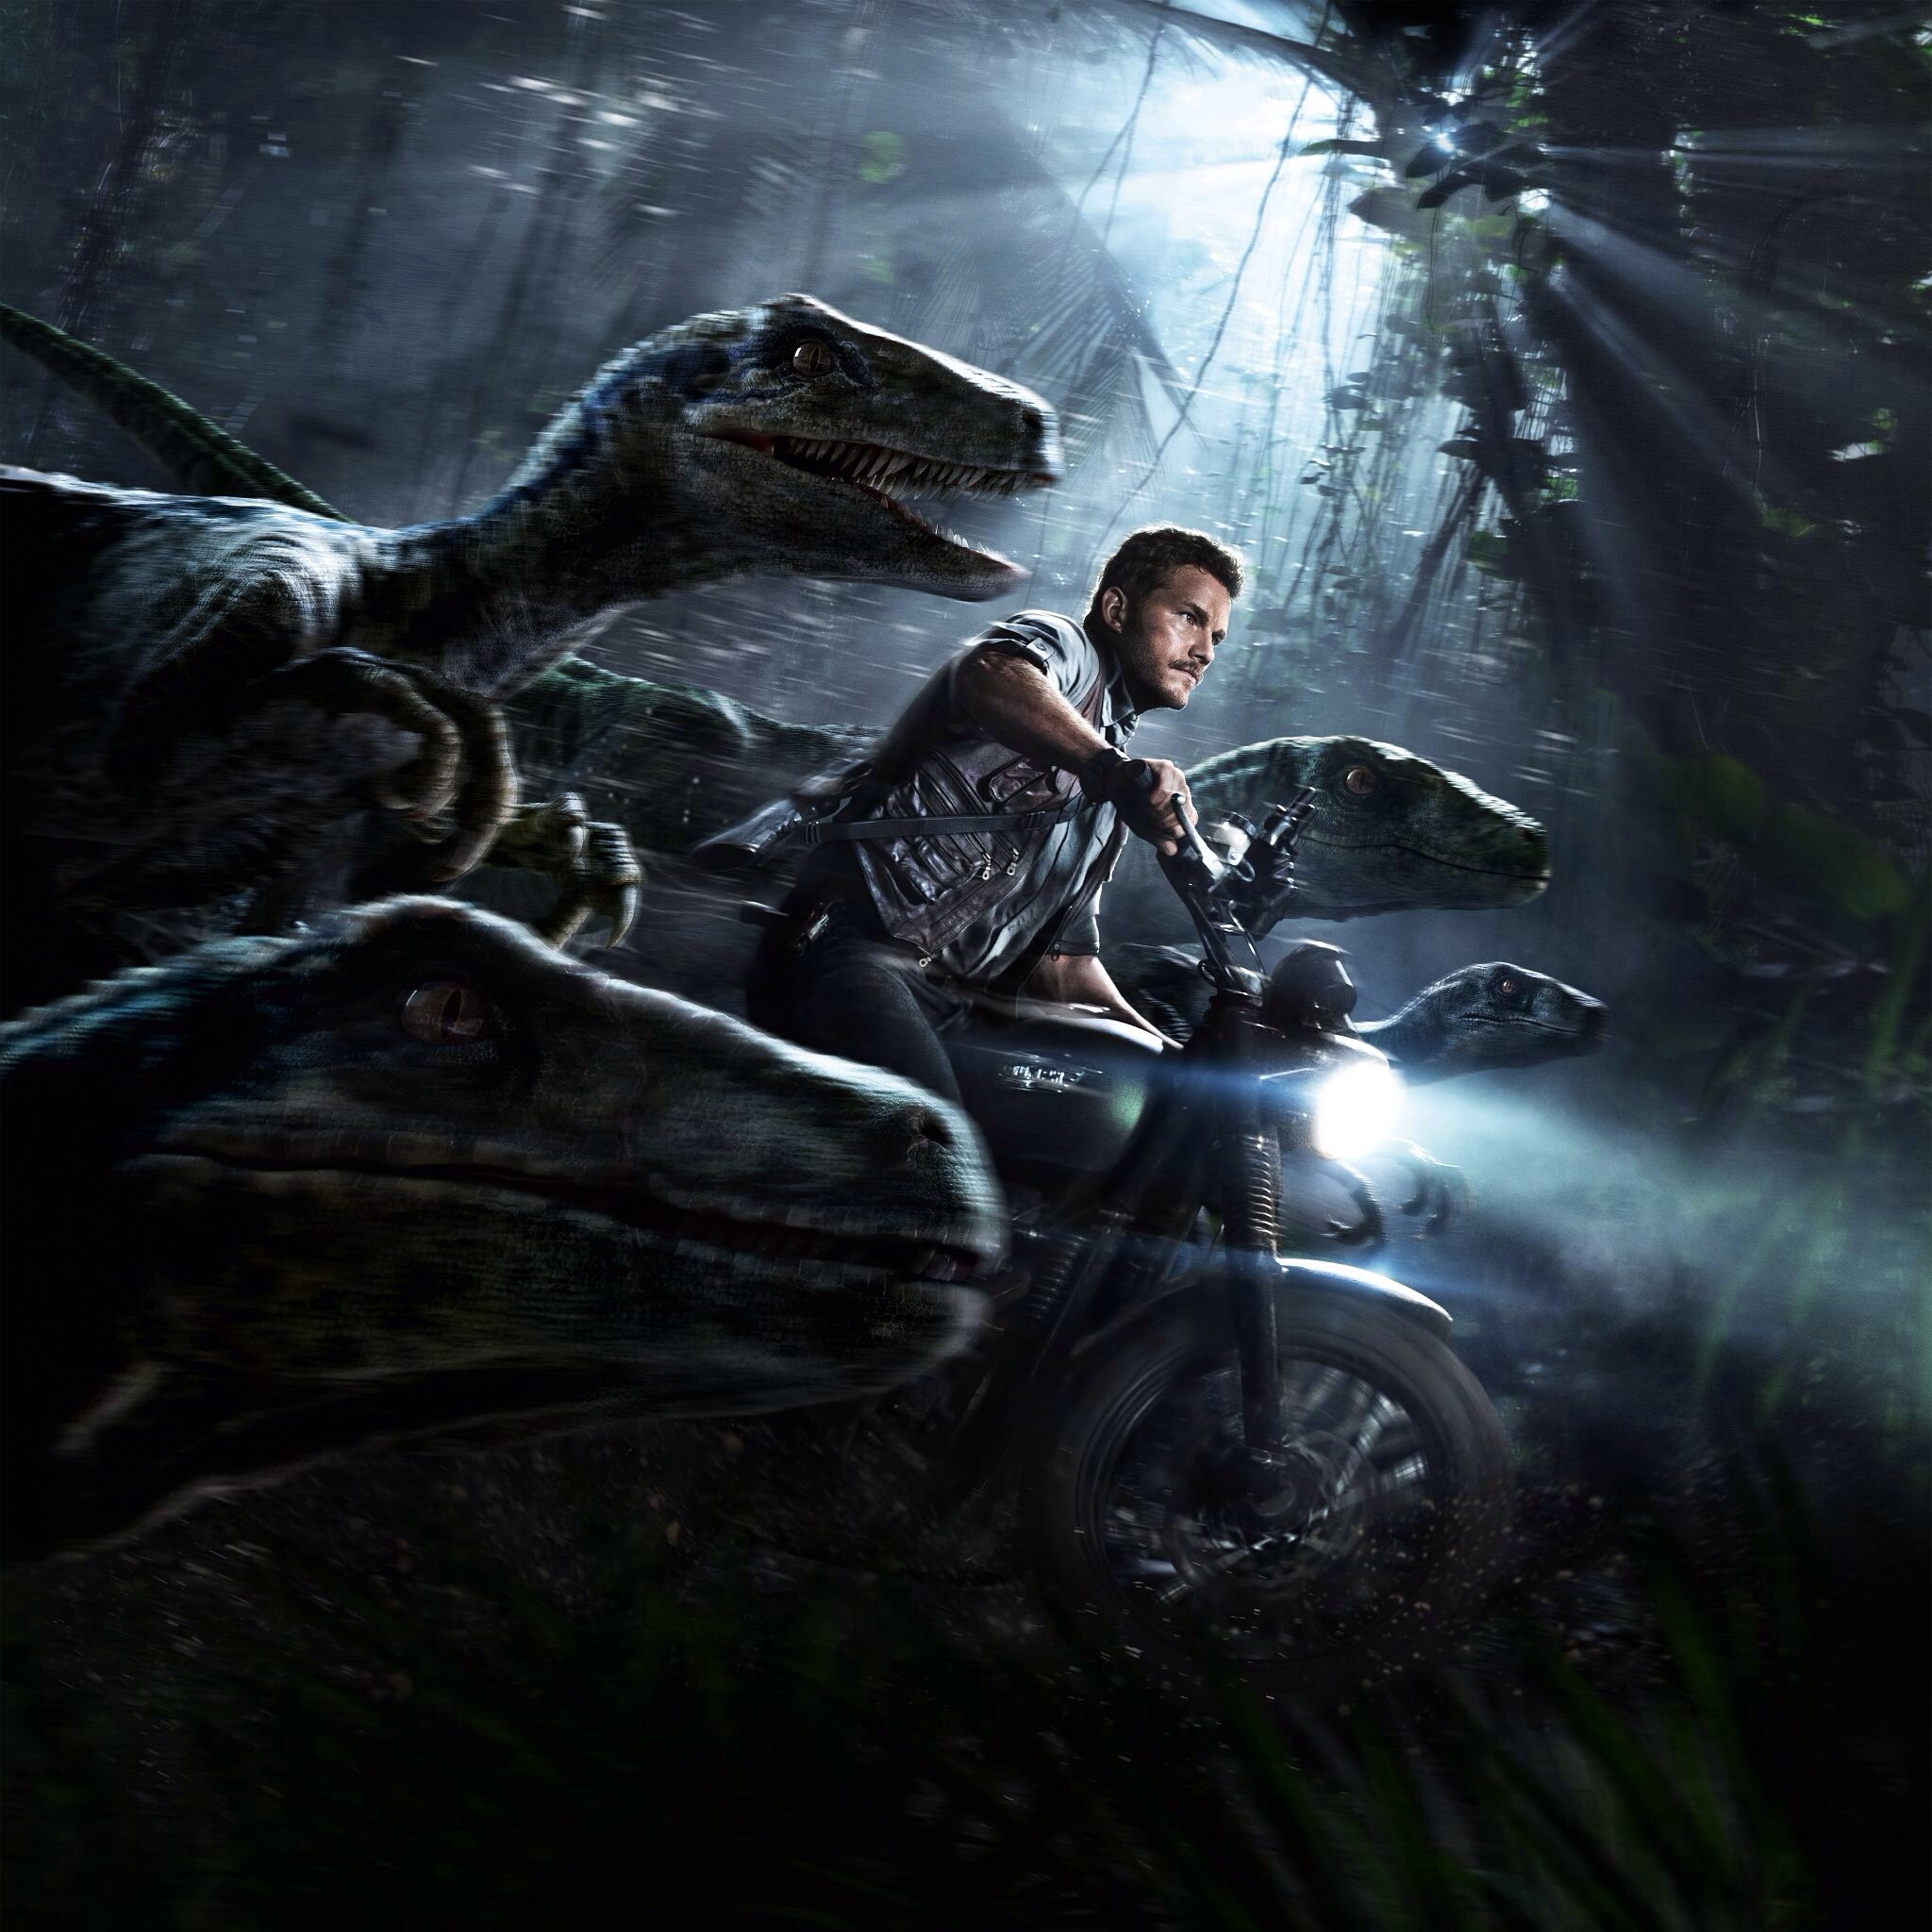 Owen Grady and his Velociraptors